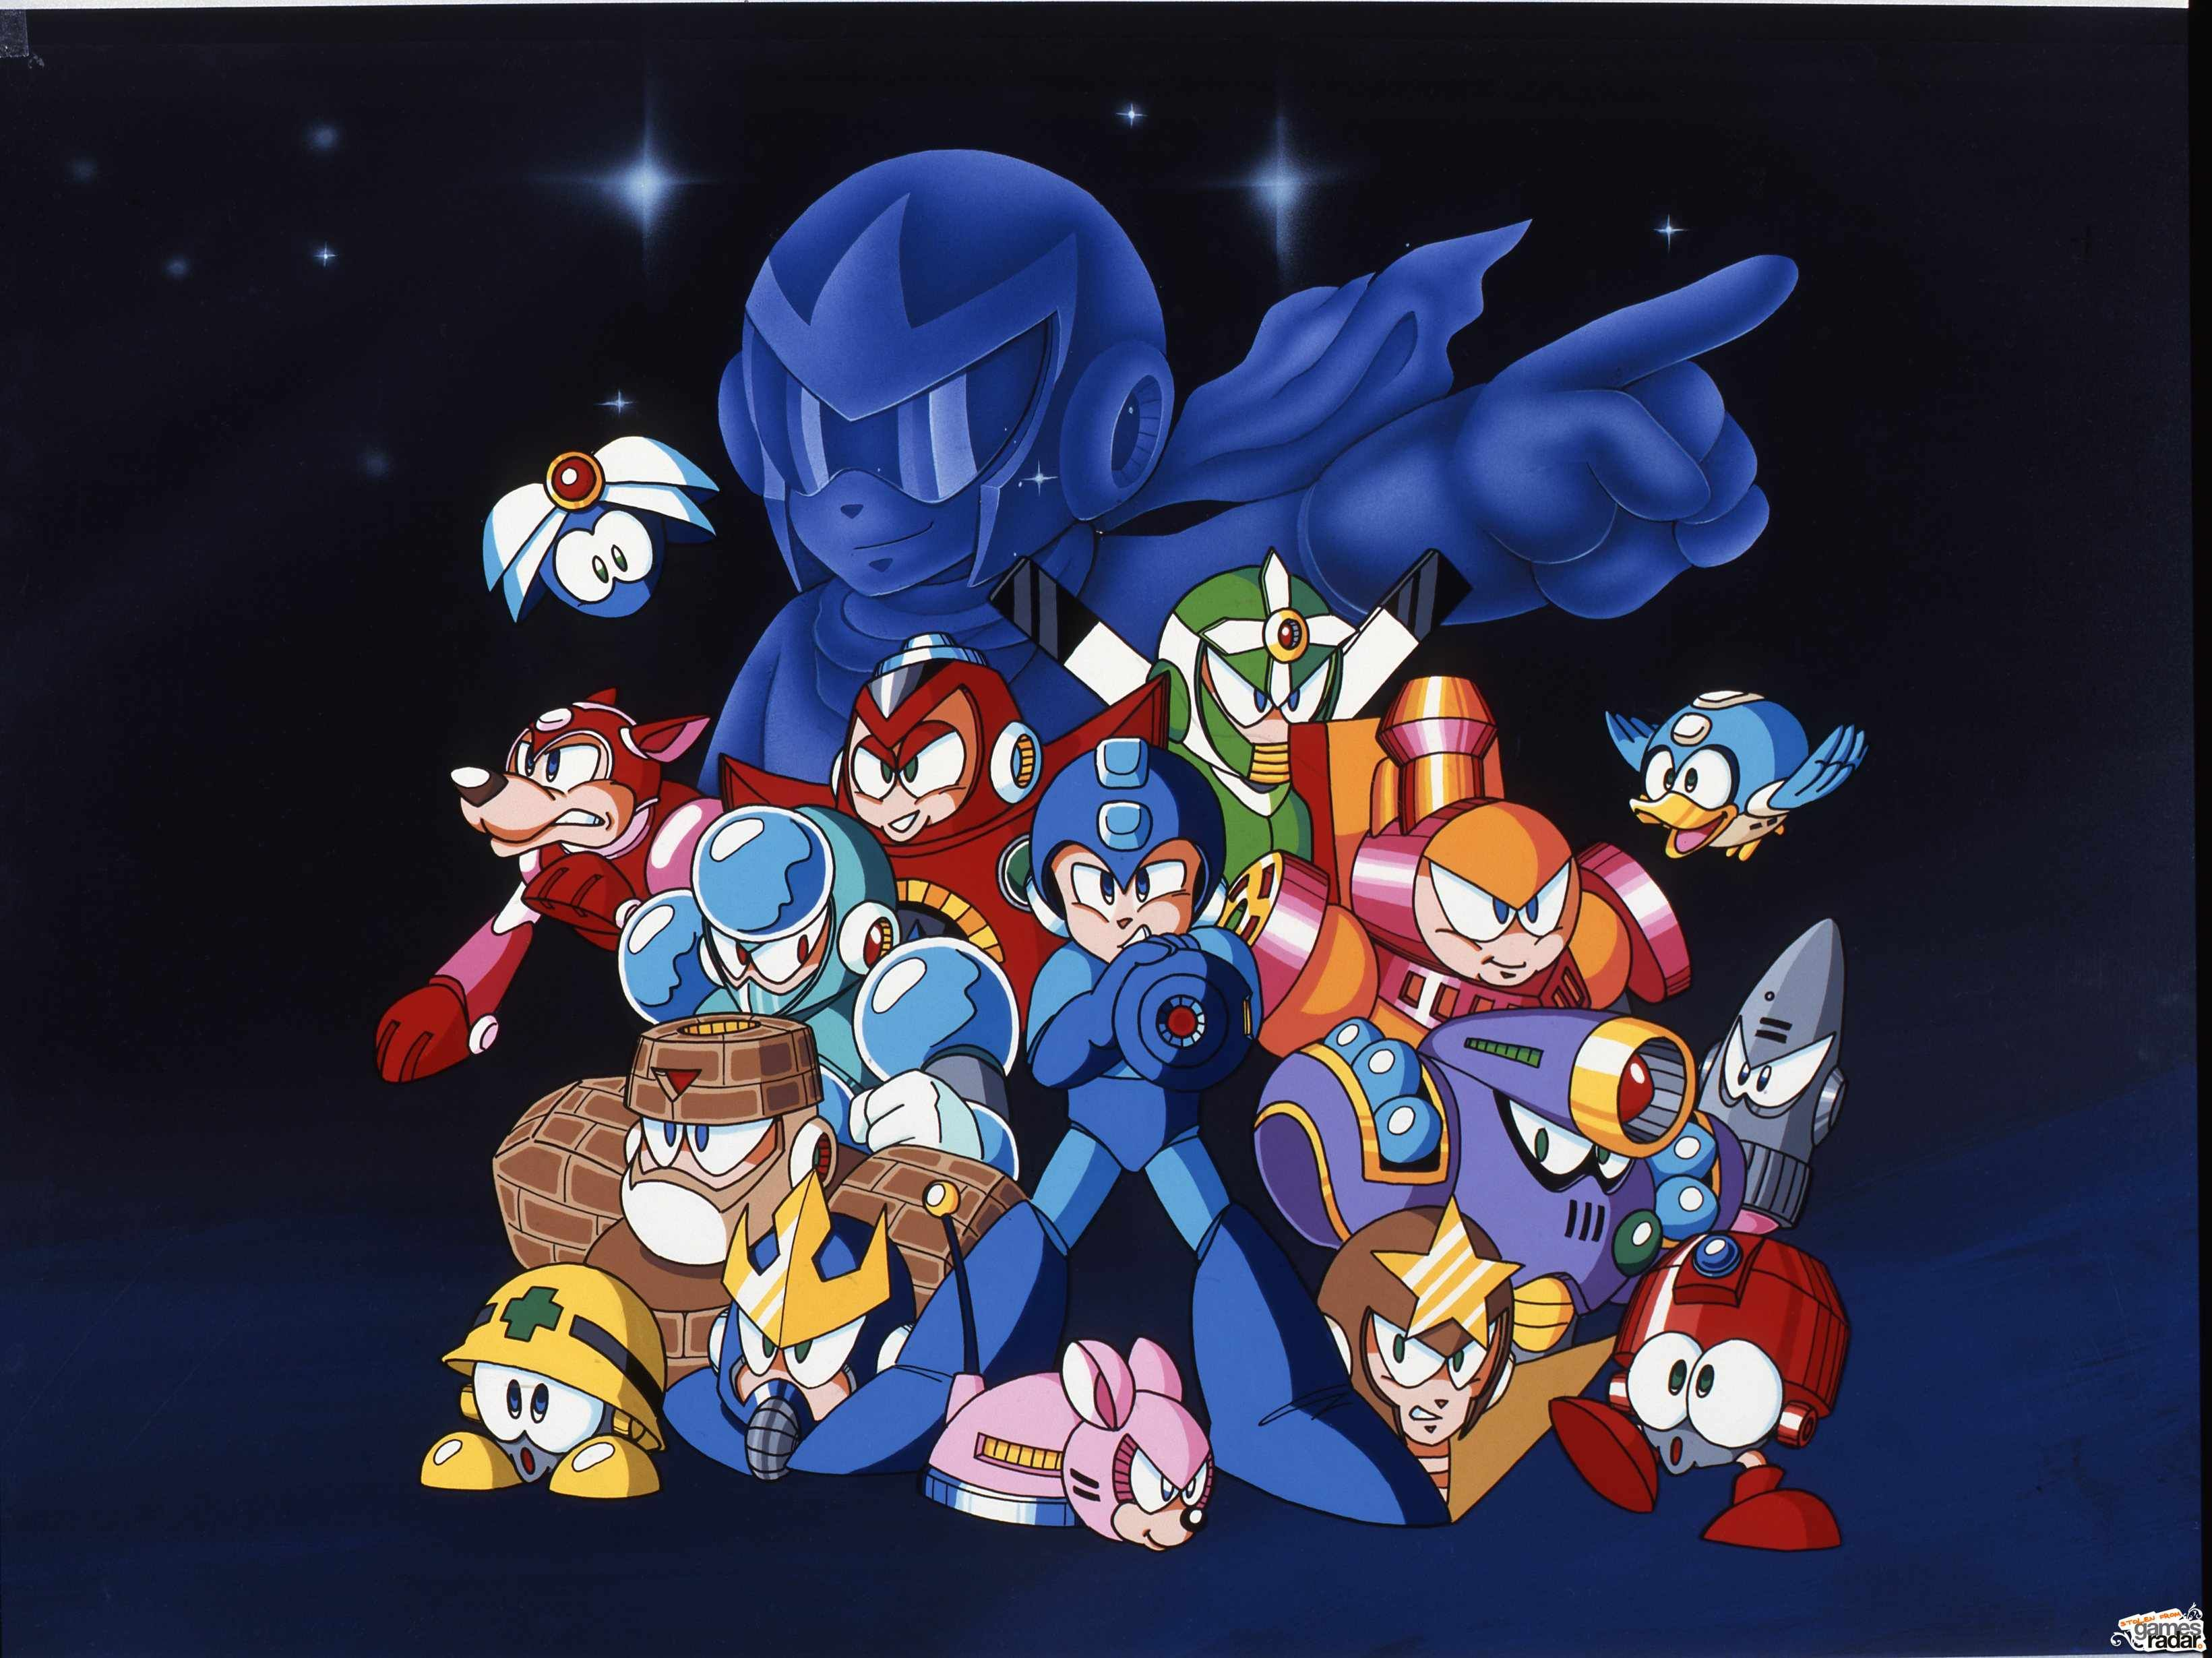 Wallpaper For The Main Characters Of Mega Man 5 Nes Mega Man Mega Man 5 Mega Man 9